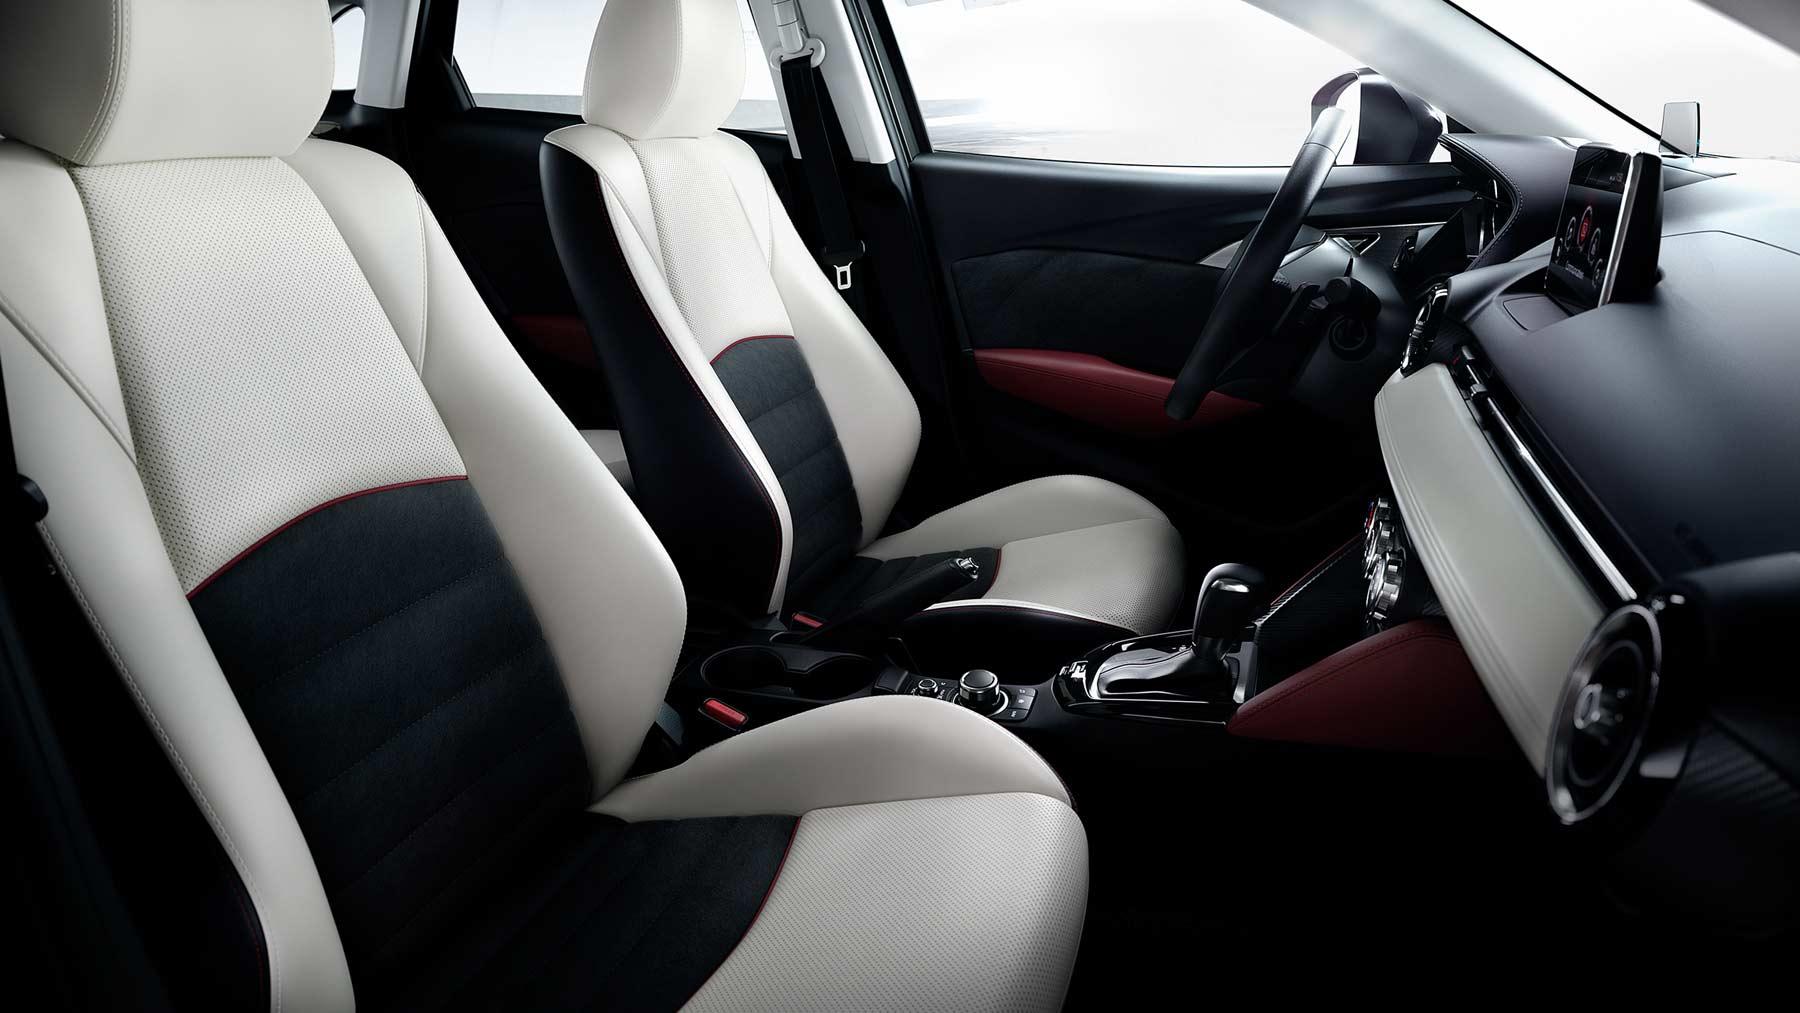 Nissan Sentra Service Manual: B1429 Seat belt buckle switch RH